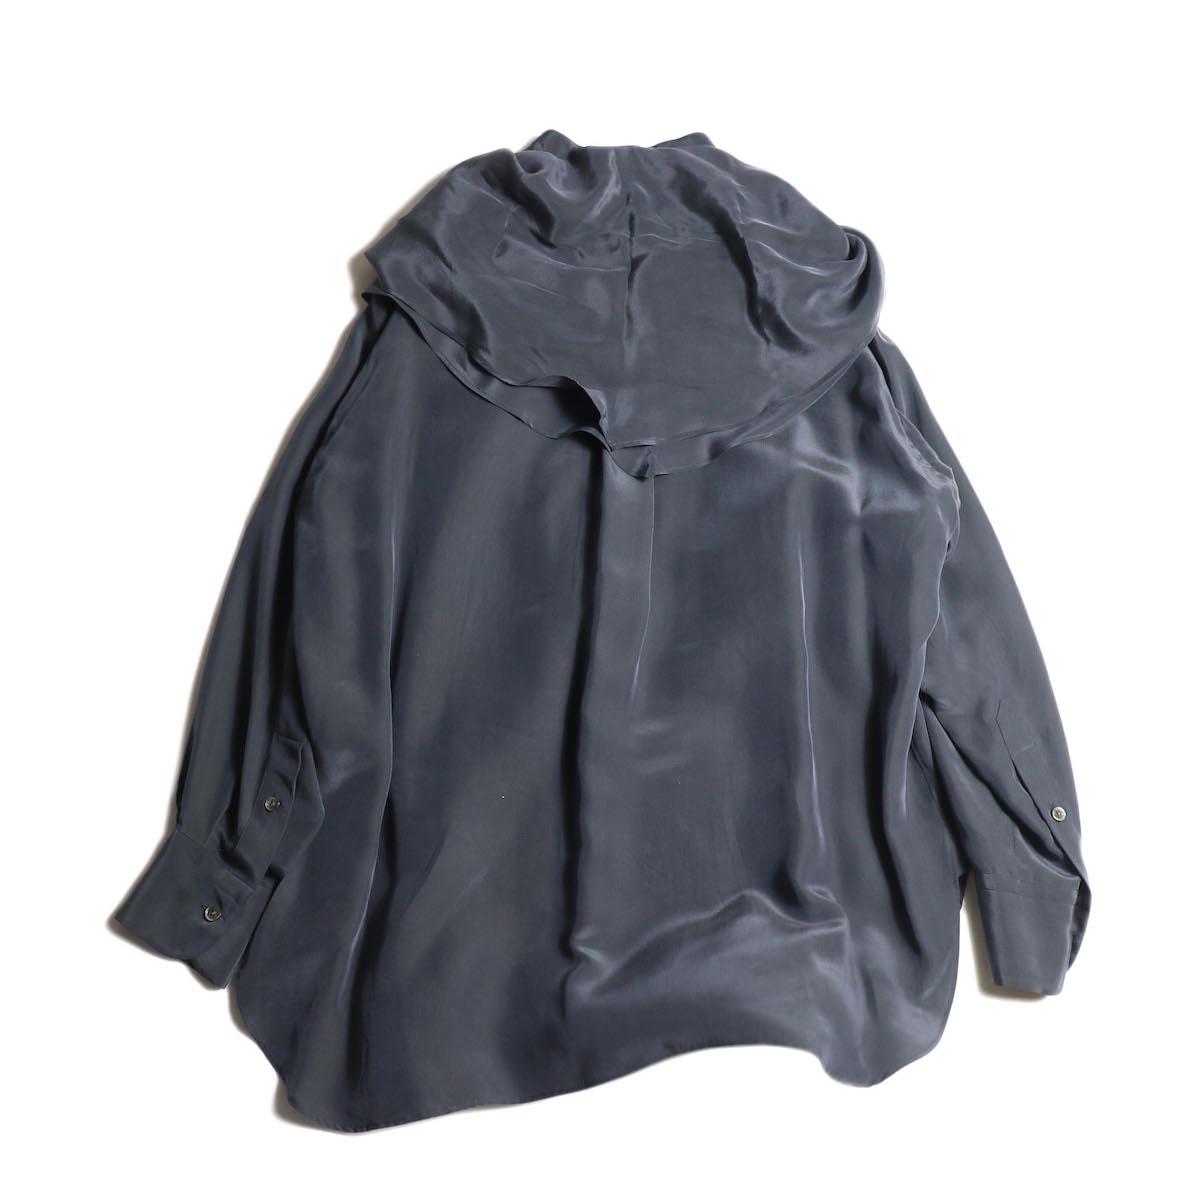 YLEVE / SILK CUPRA SUEDE BL (charcoal) スカーフ付き 背面